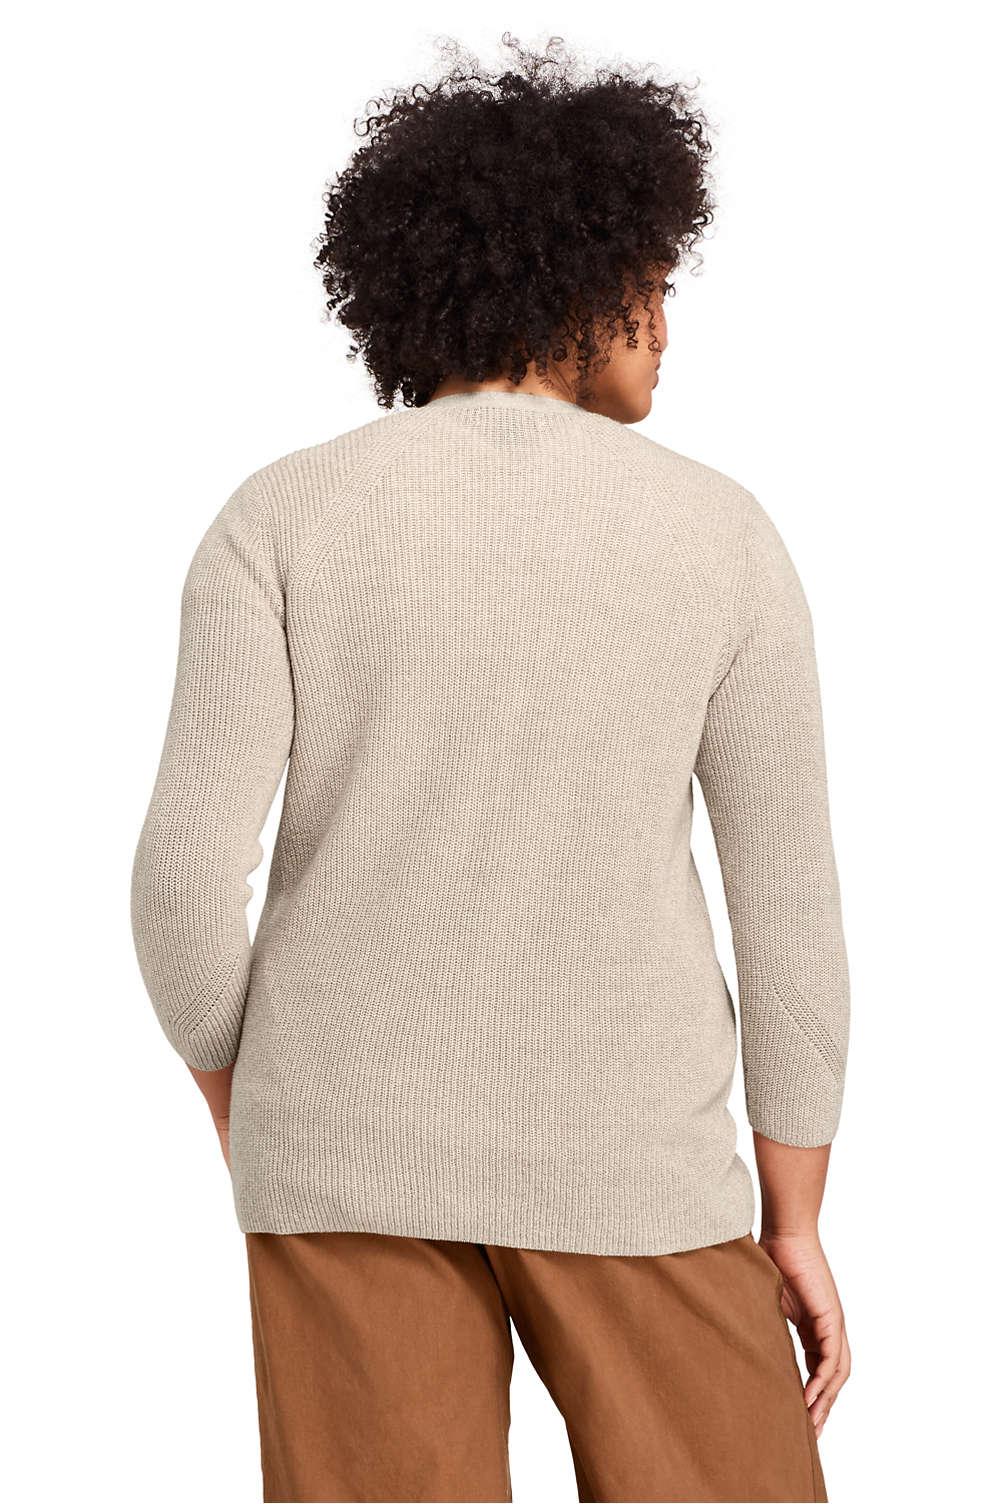 d1c27f4ef47 Women s Plus Size Linen Cotton 3 4 Sleeve Shaker V-neck Cardigan ...